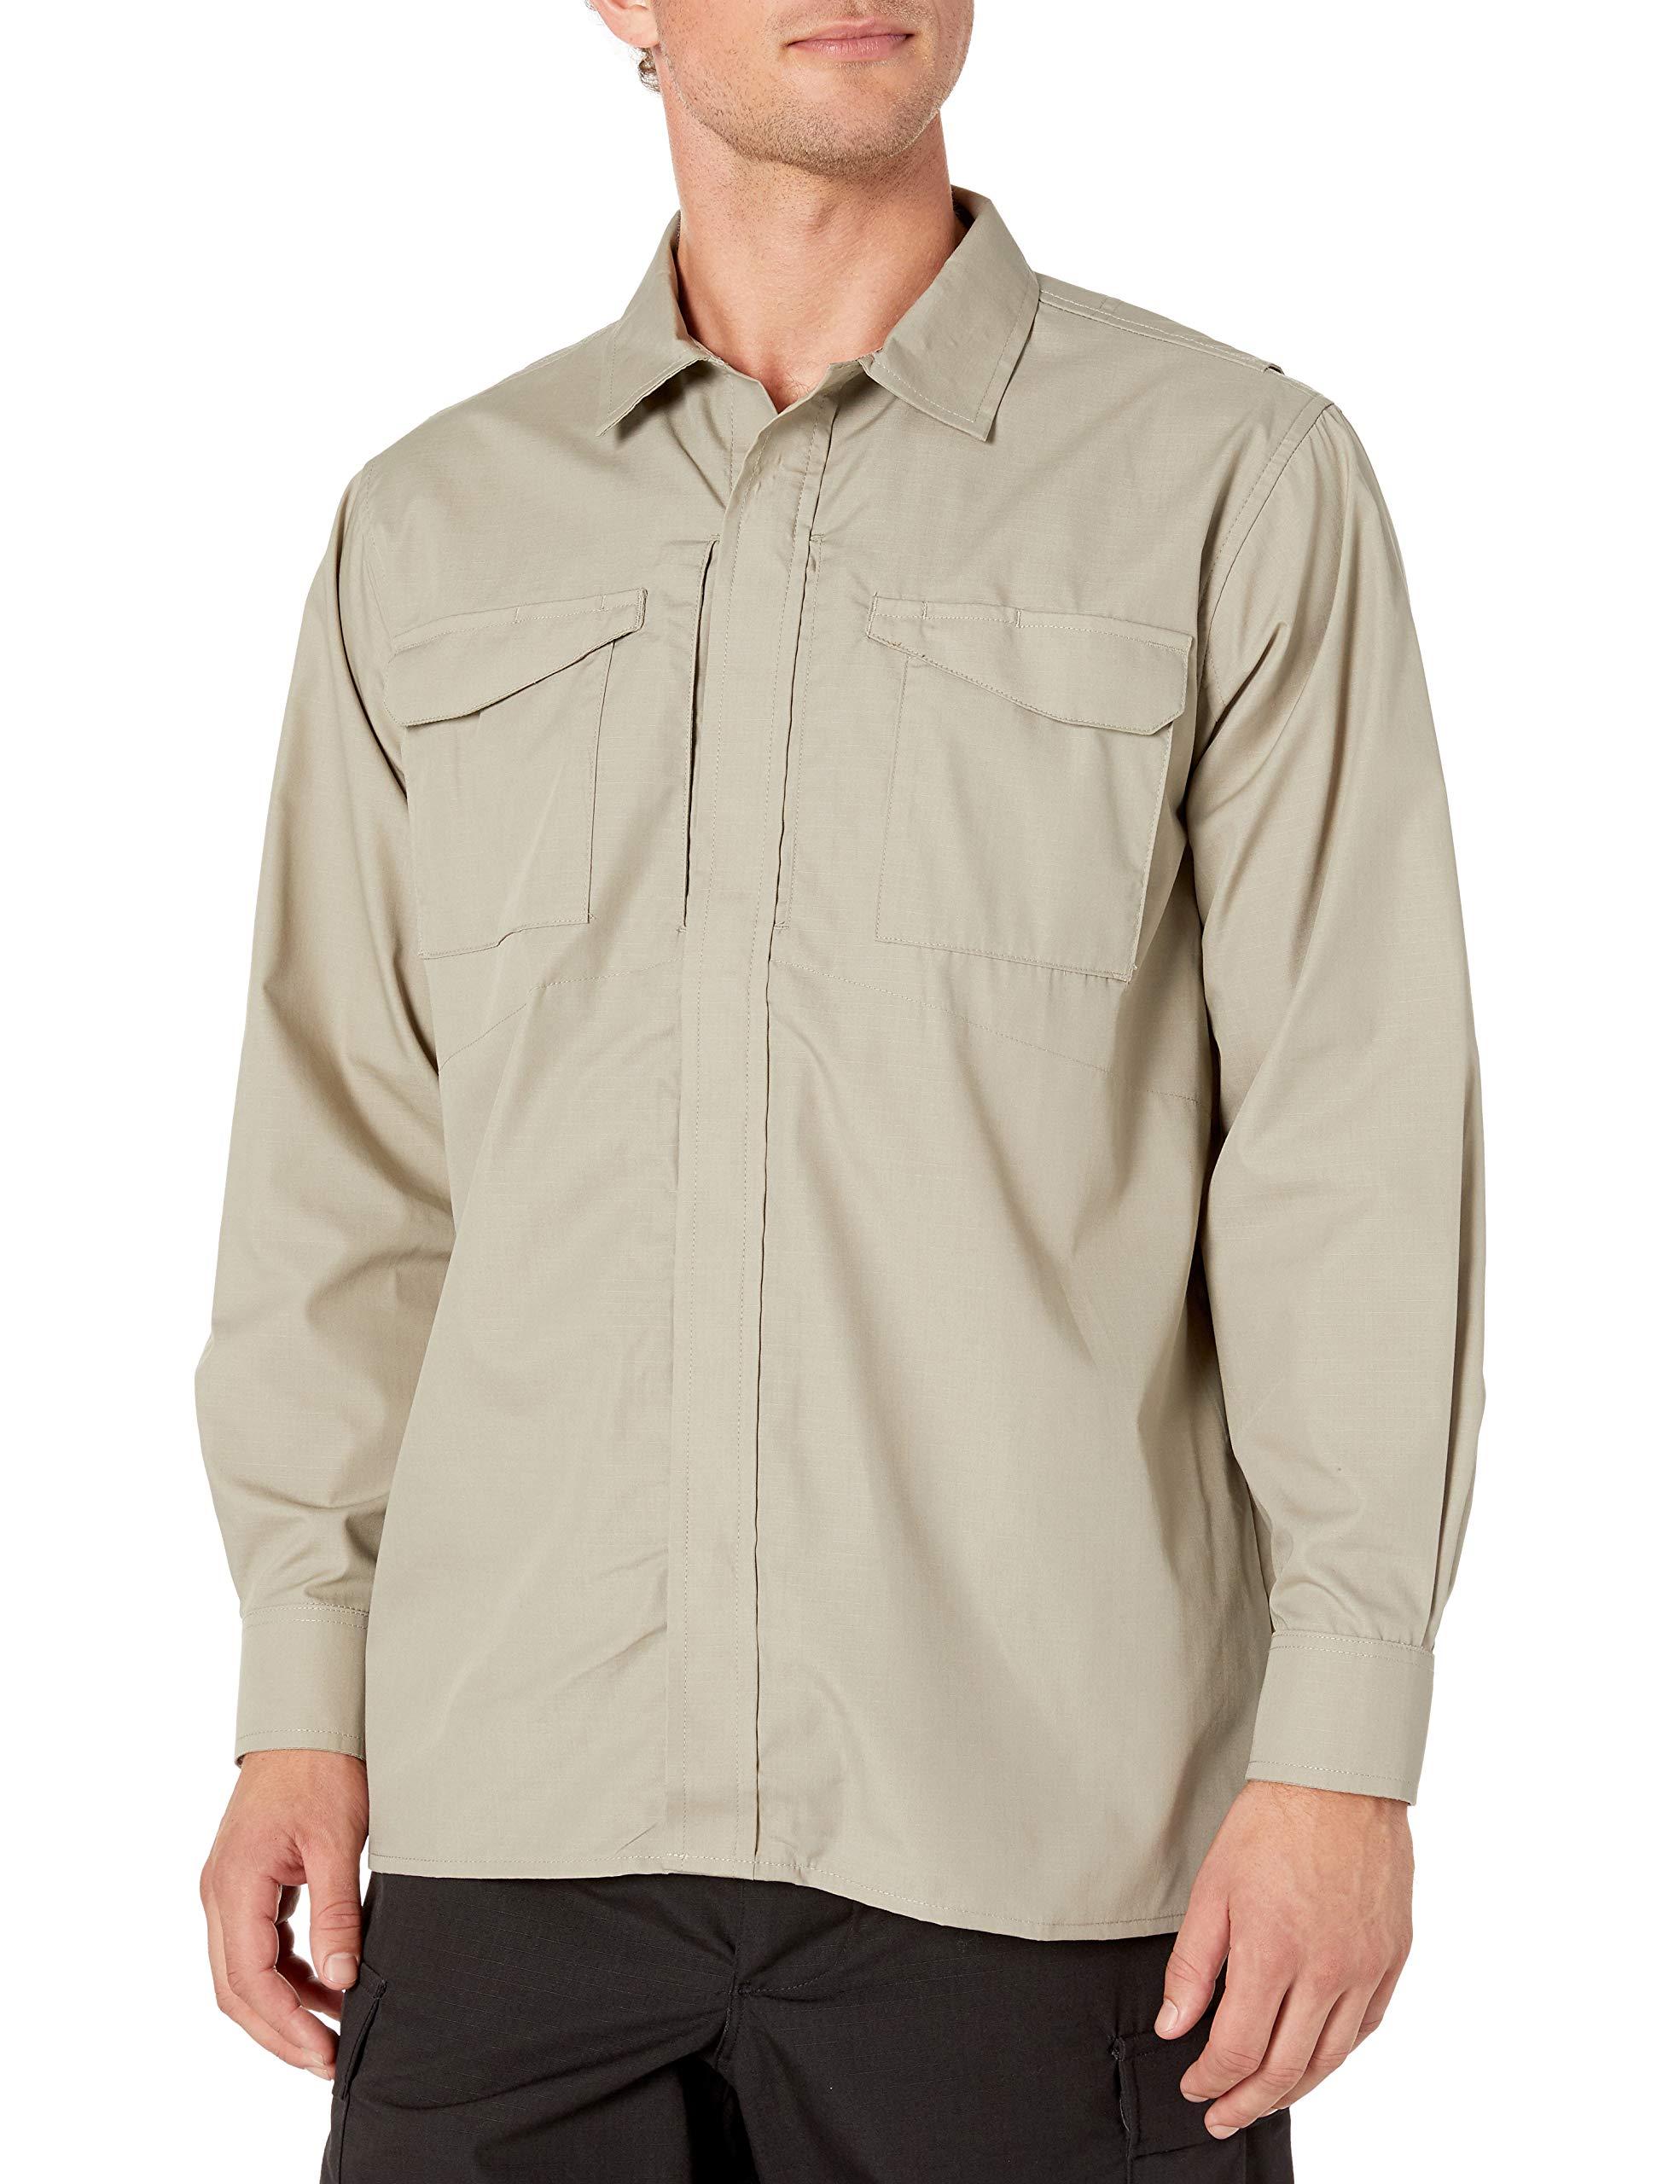 Tru-Spec 24-7 1051002 Men's Ultralight Long Sleeve Uniform Shirt, Polyester Cotton Rip-Stop, X-Small Regular, Black